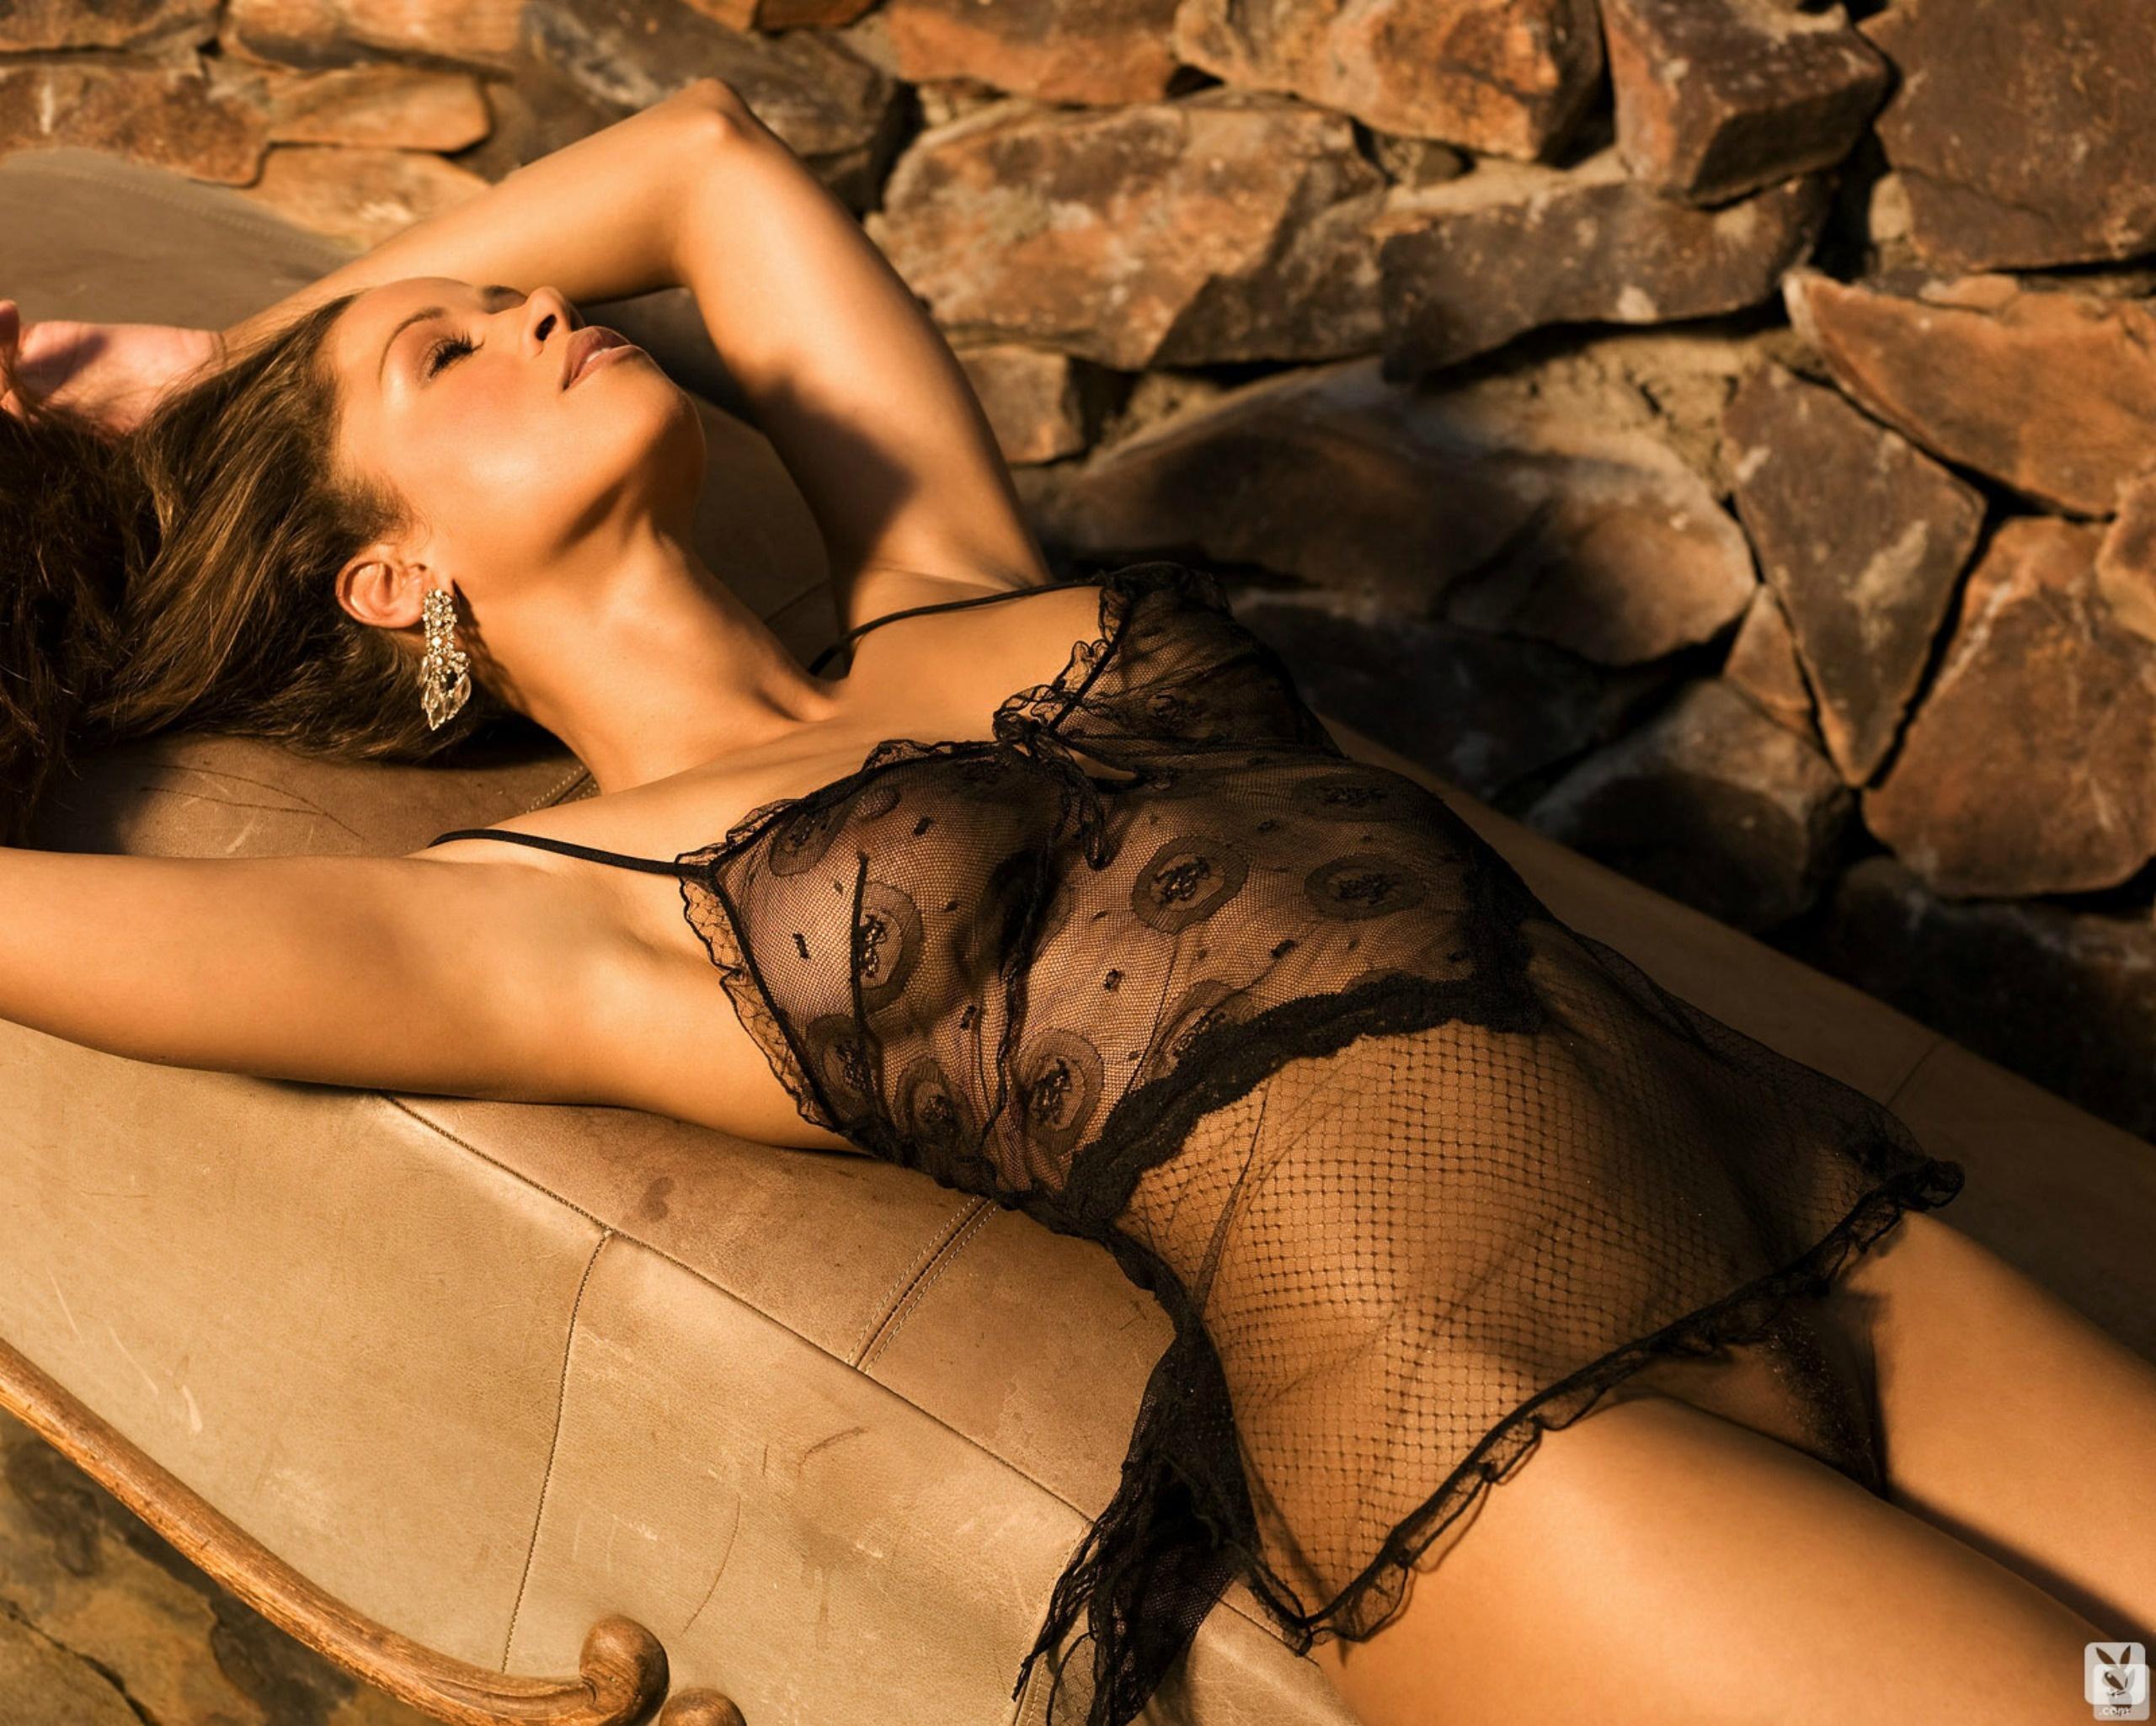 Stephanie courtney bj sex naked